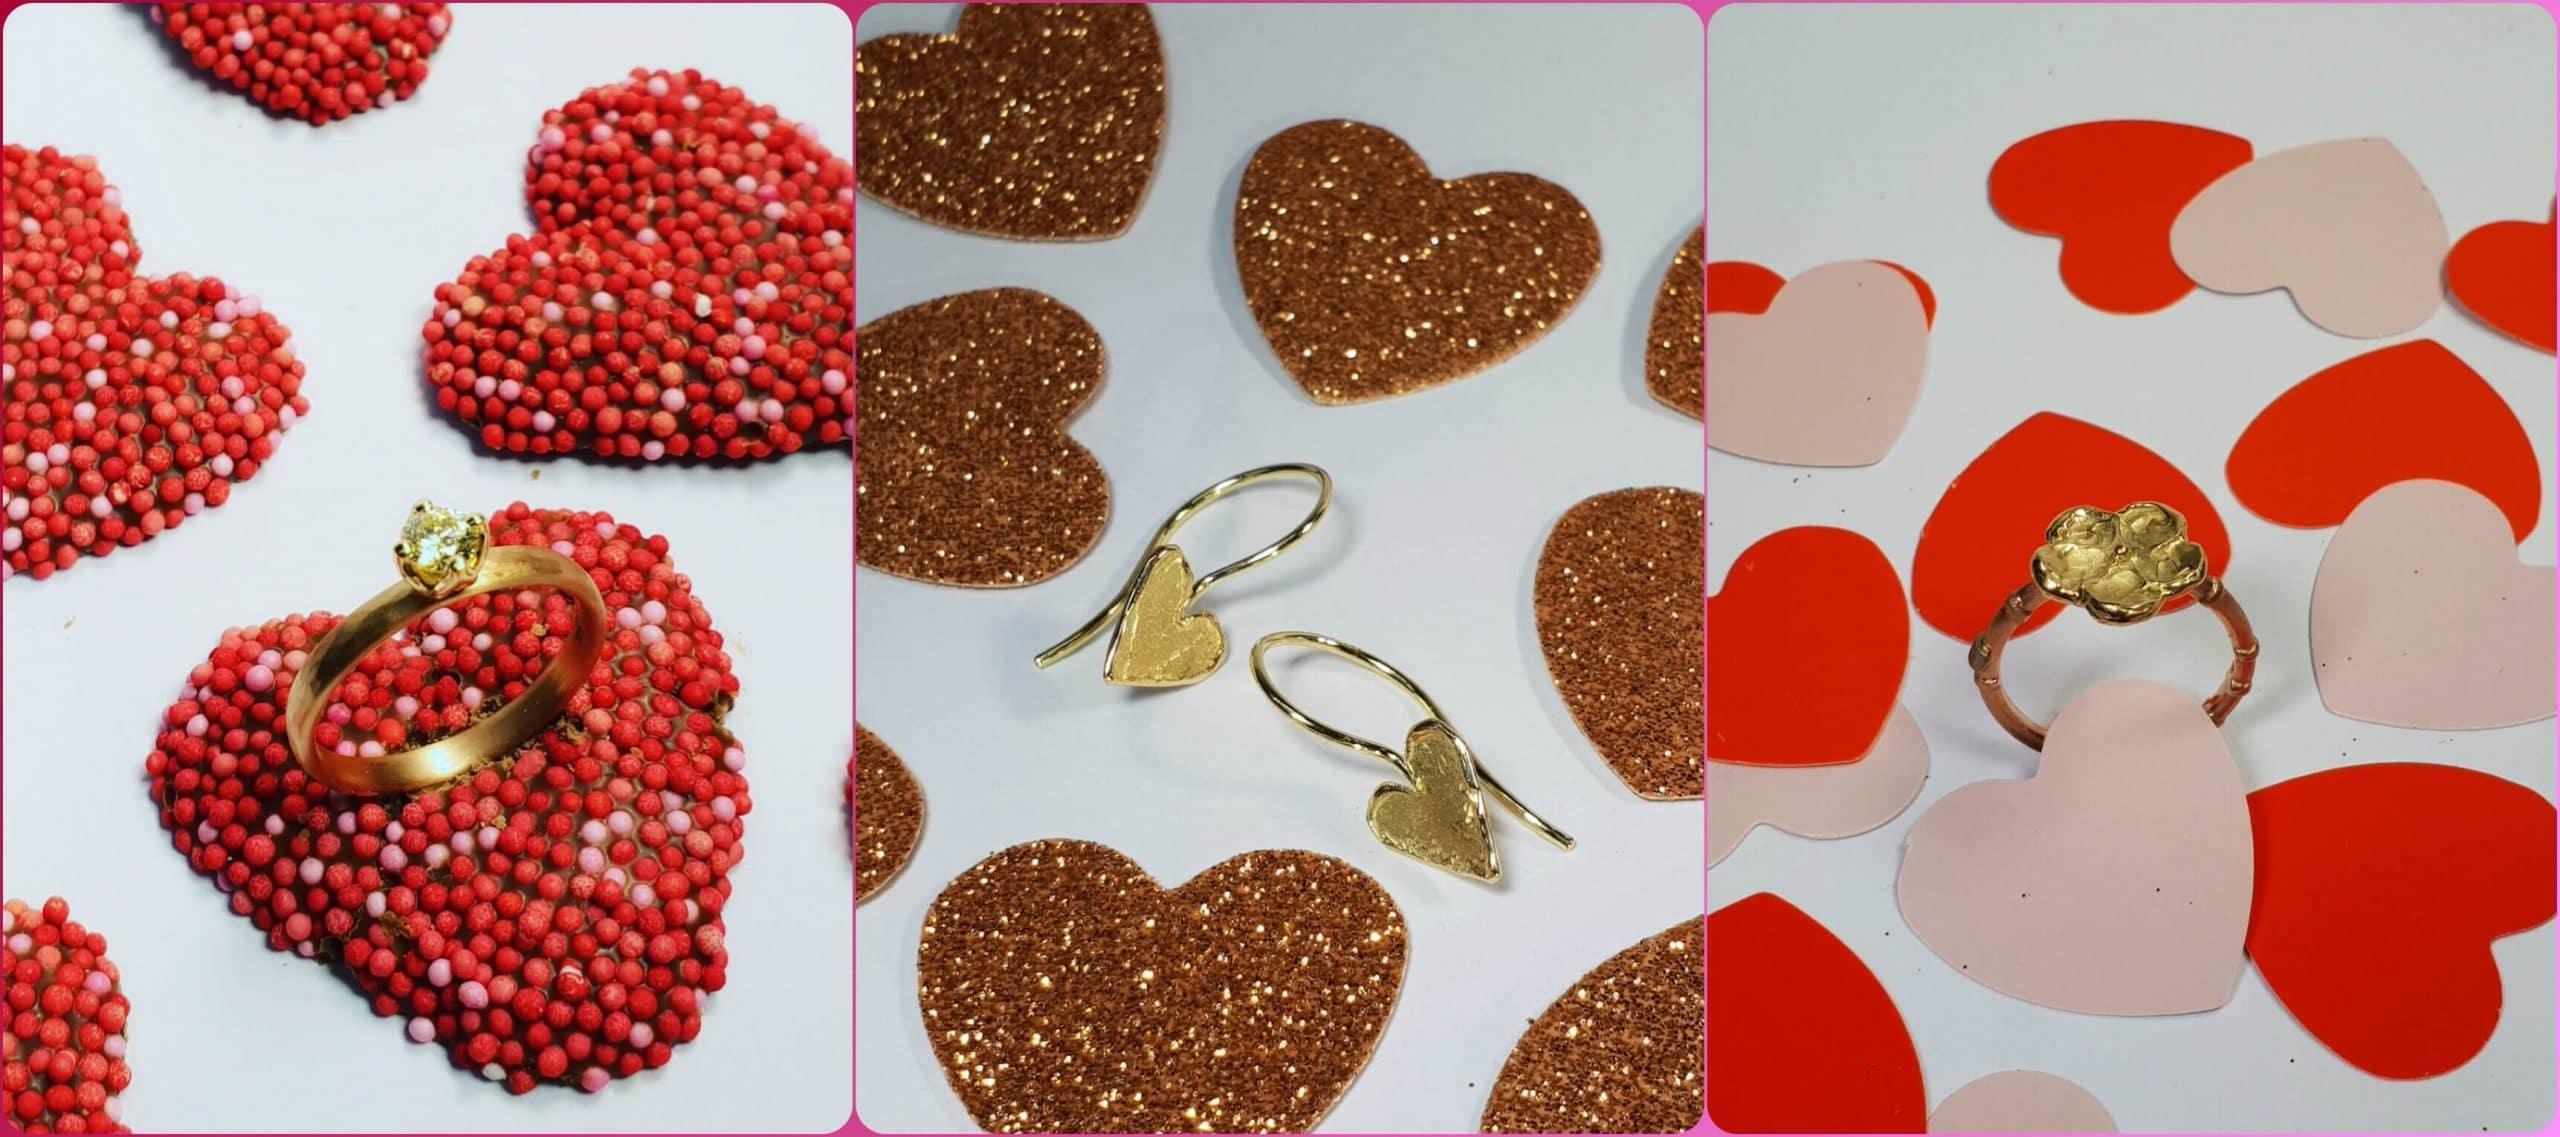 Blog Valentijn cadeaus - handgemaakte sieraden Oogst Amsterdam